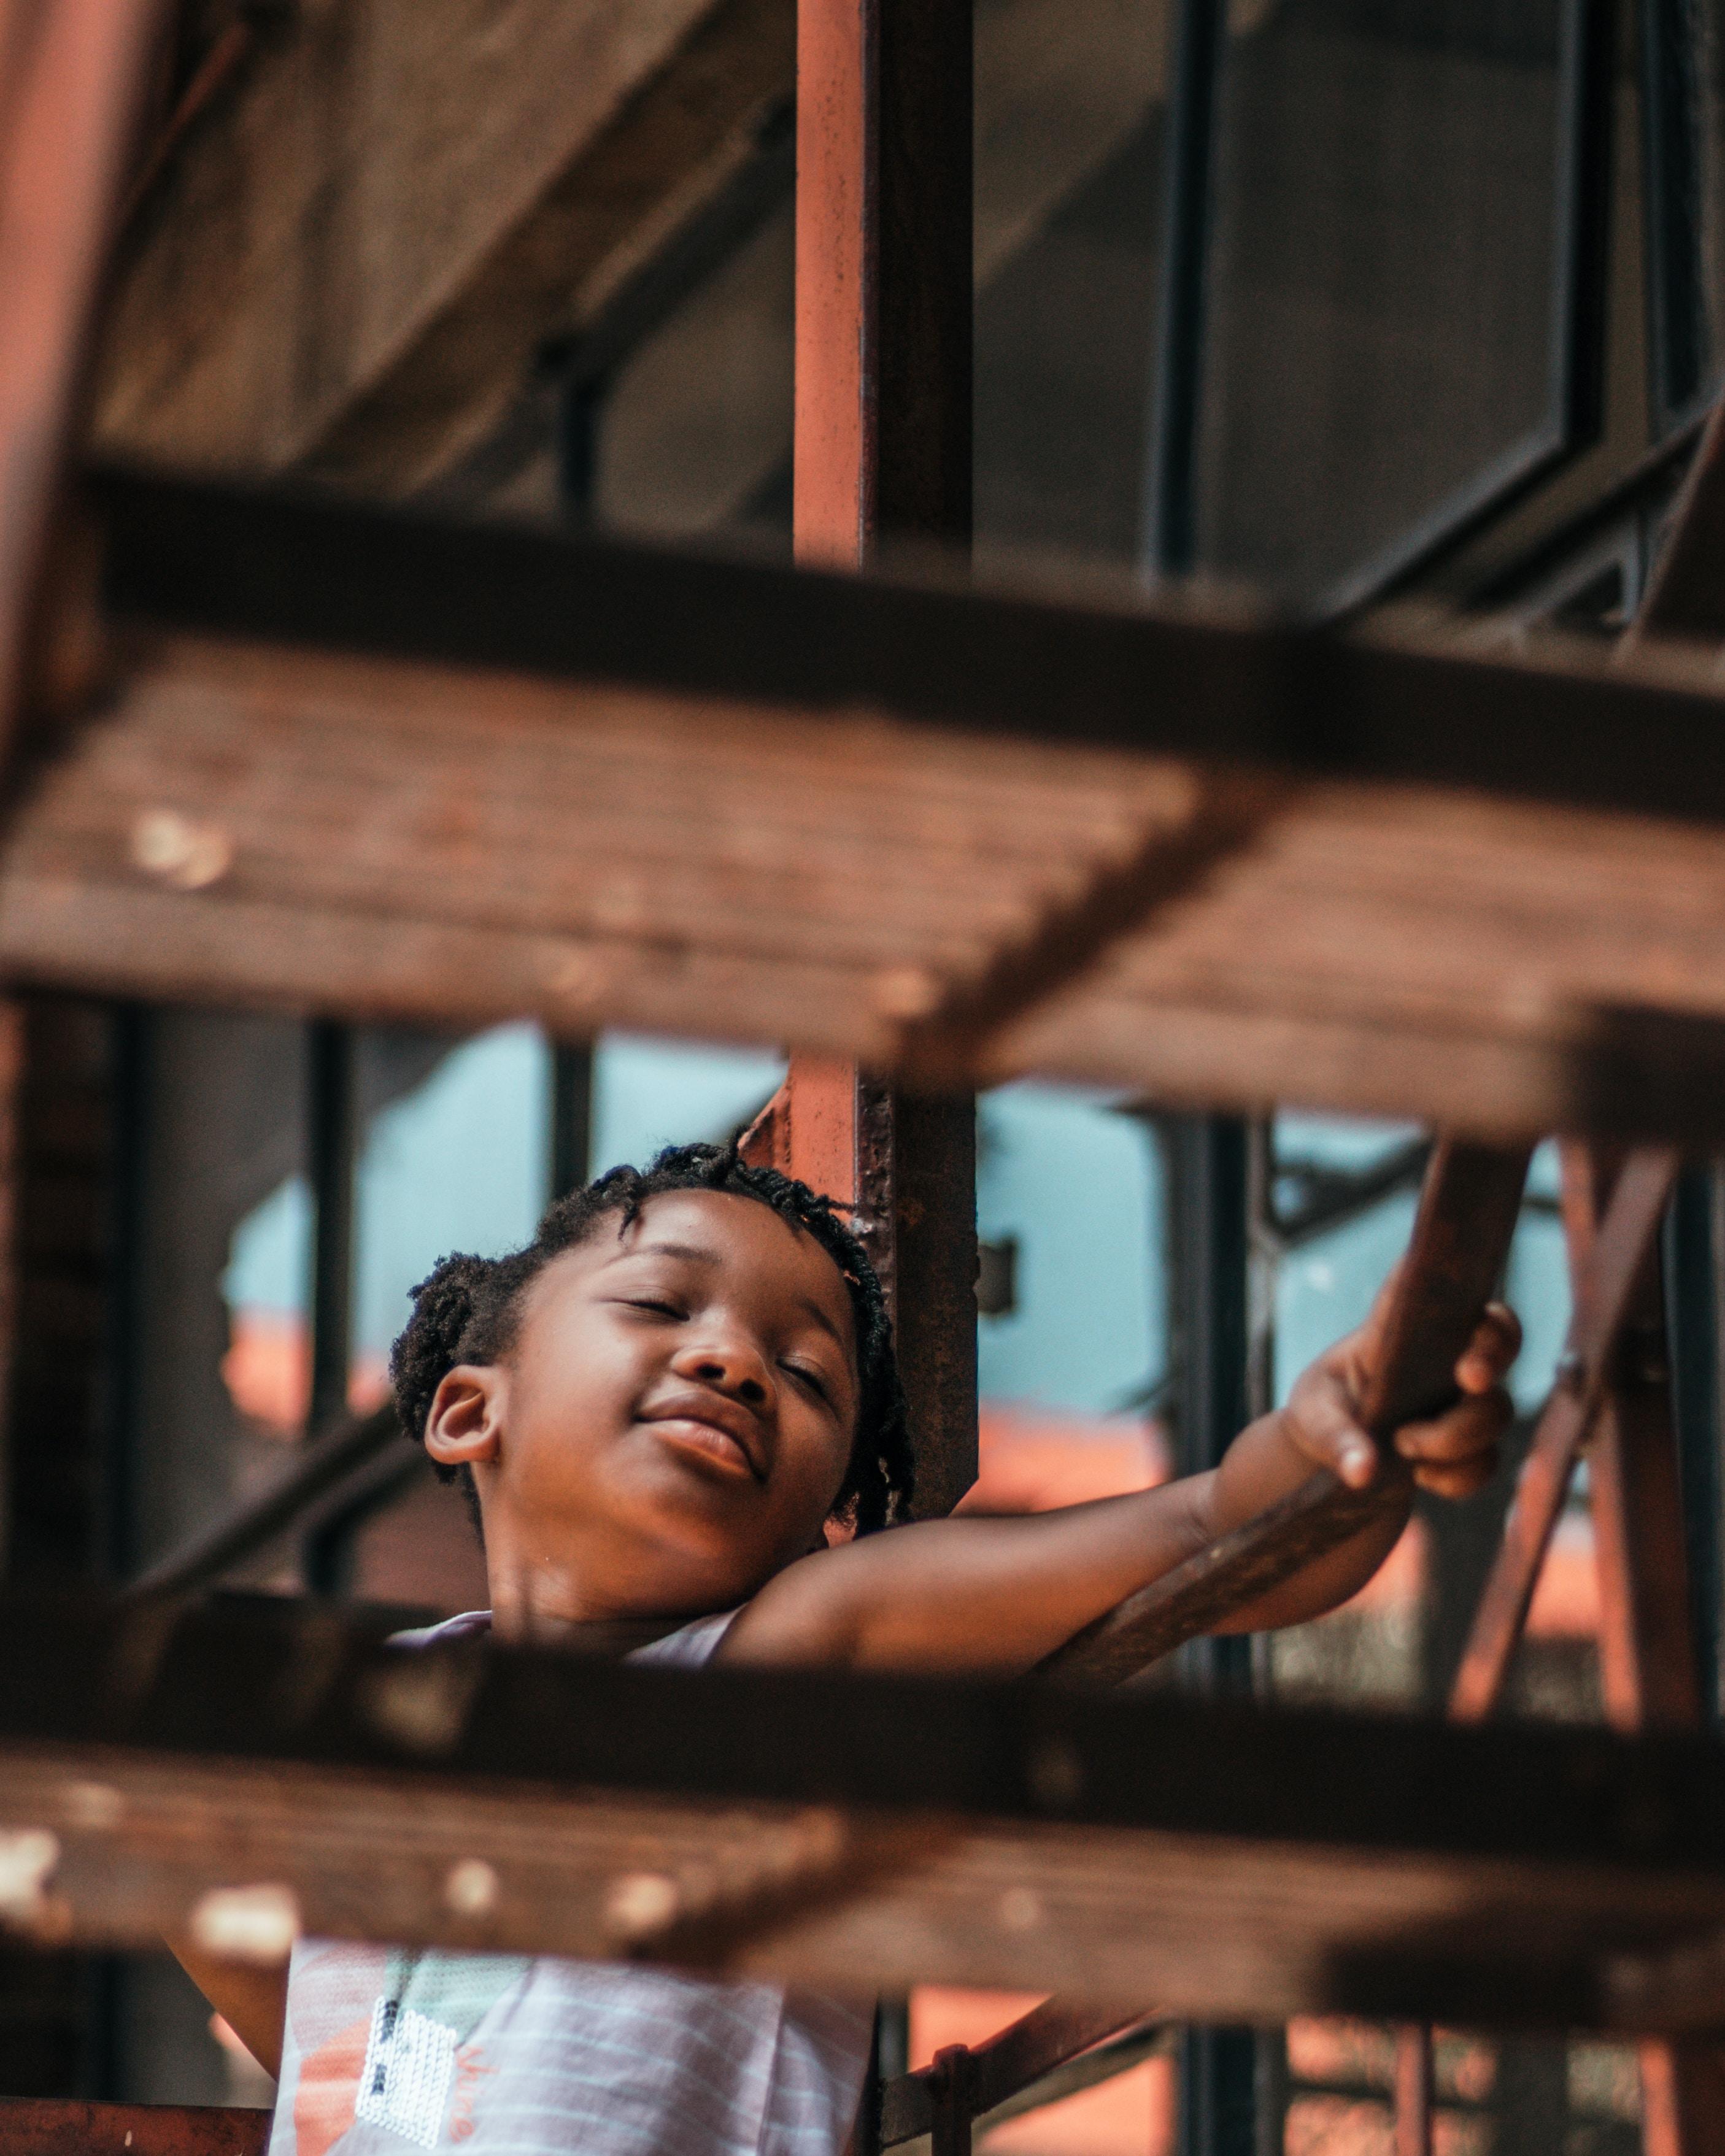 girl on stair near building